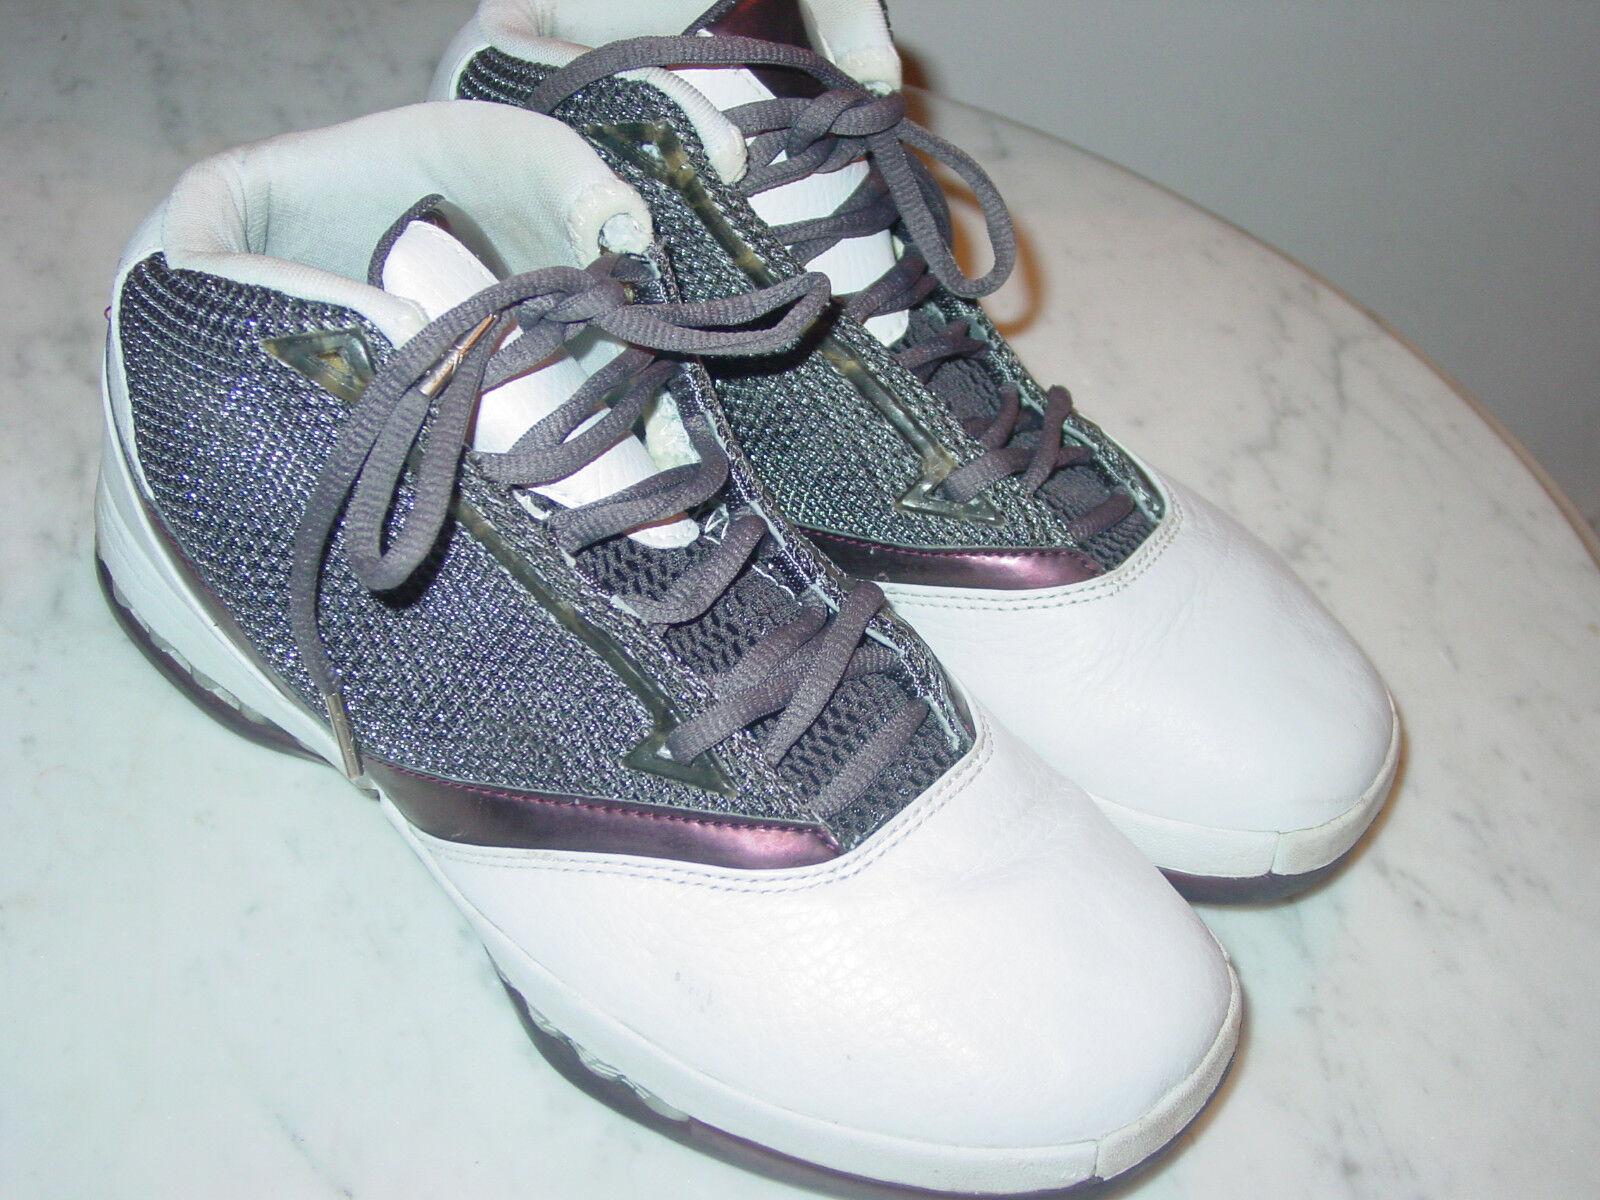 2018 Nike Air Jordan Retro 16 + QM OG Cherrywood/Whisper White Shoes! Comfortable Cheap women's shoes women's shoes